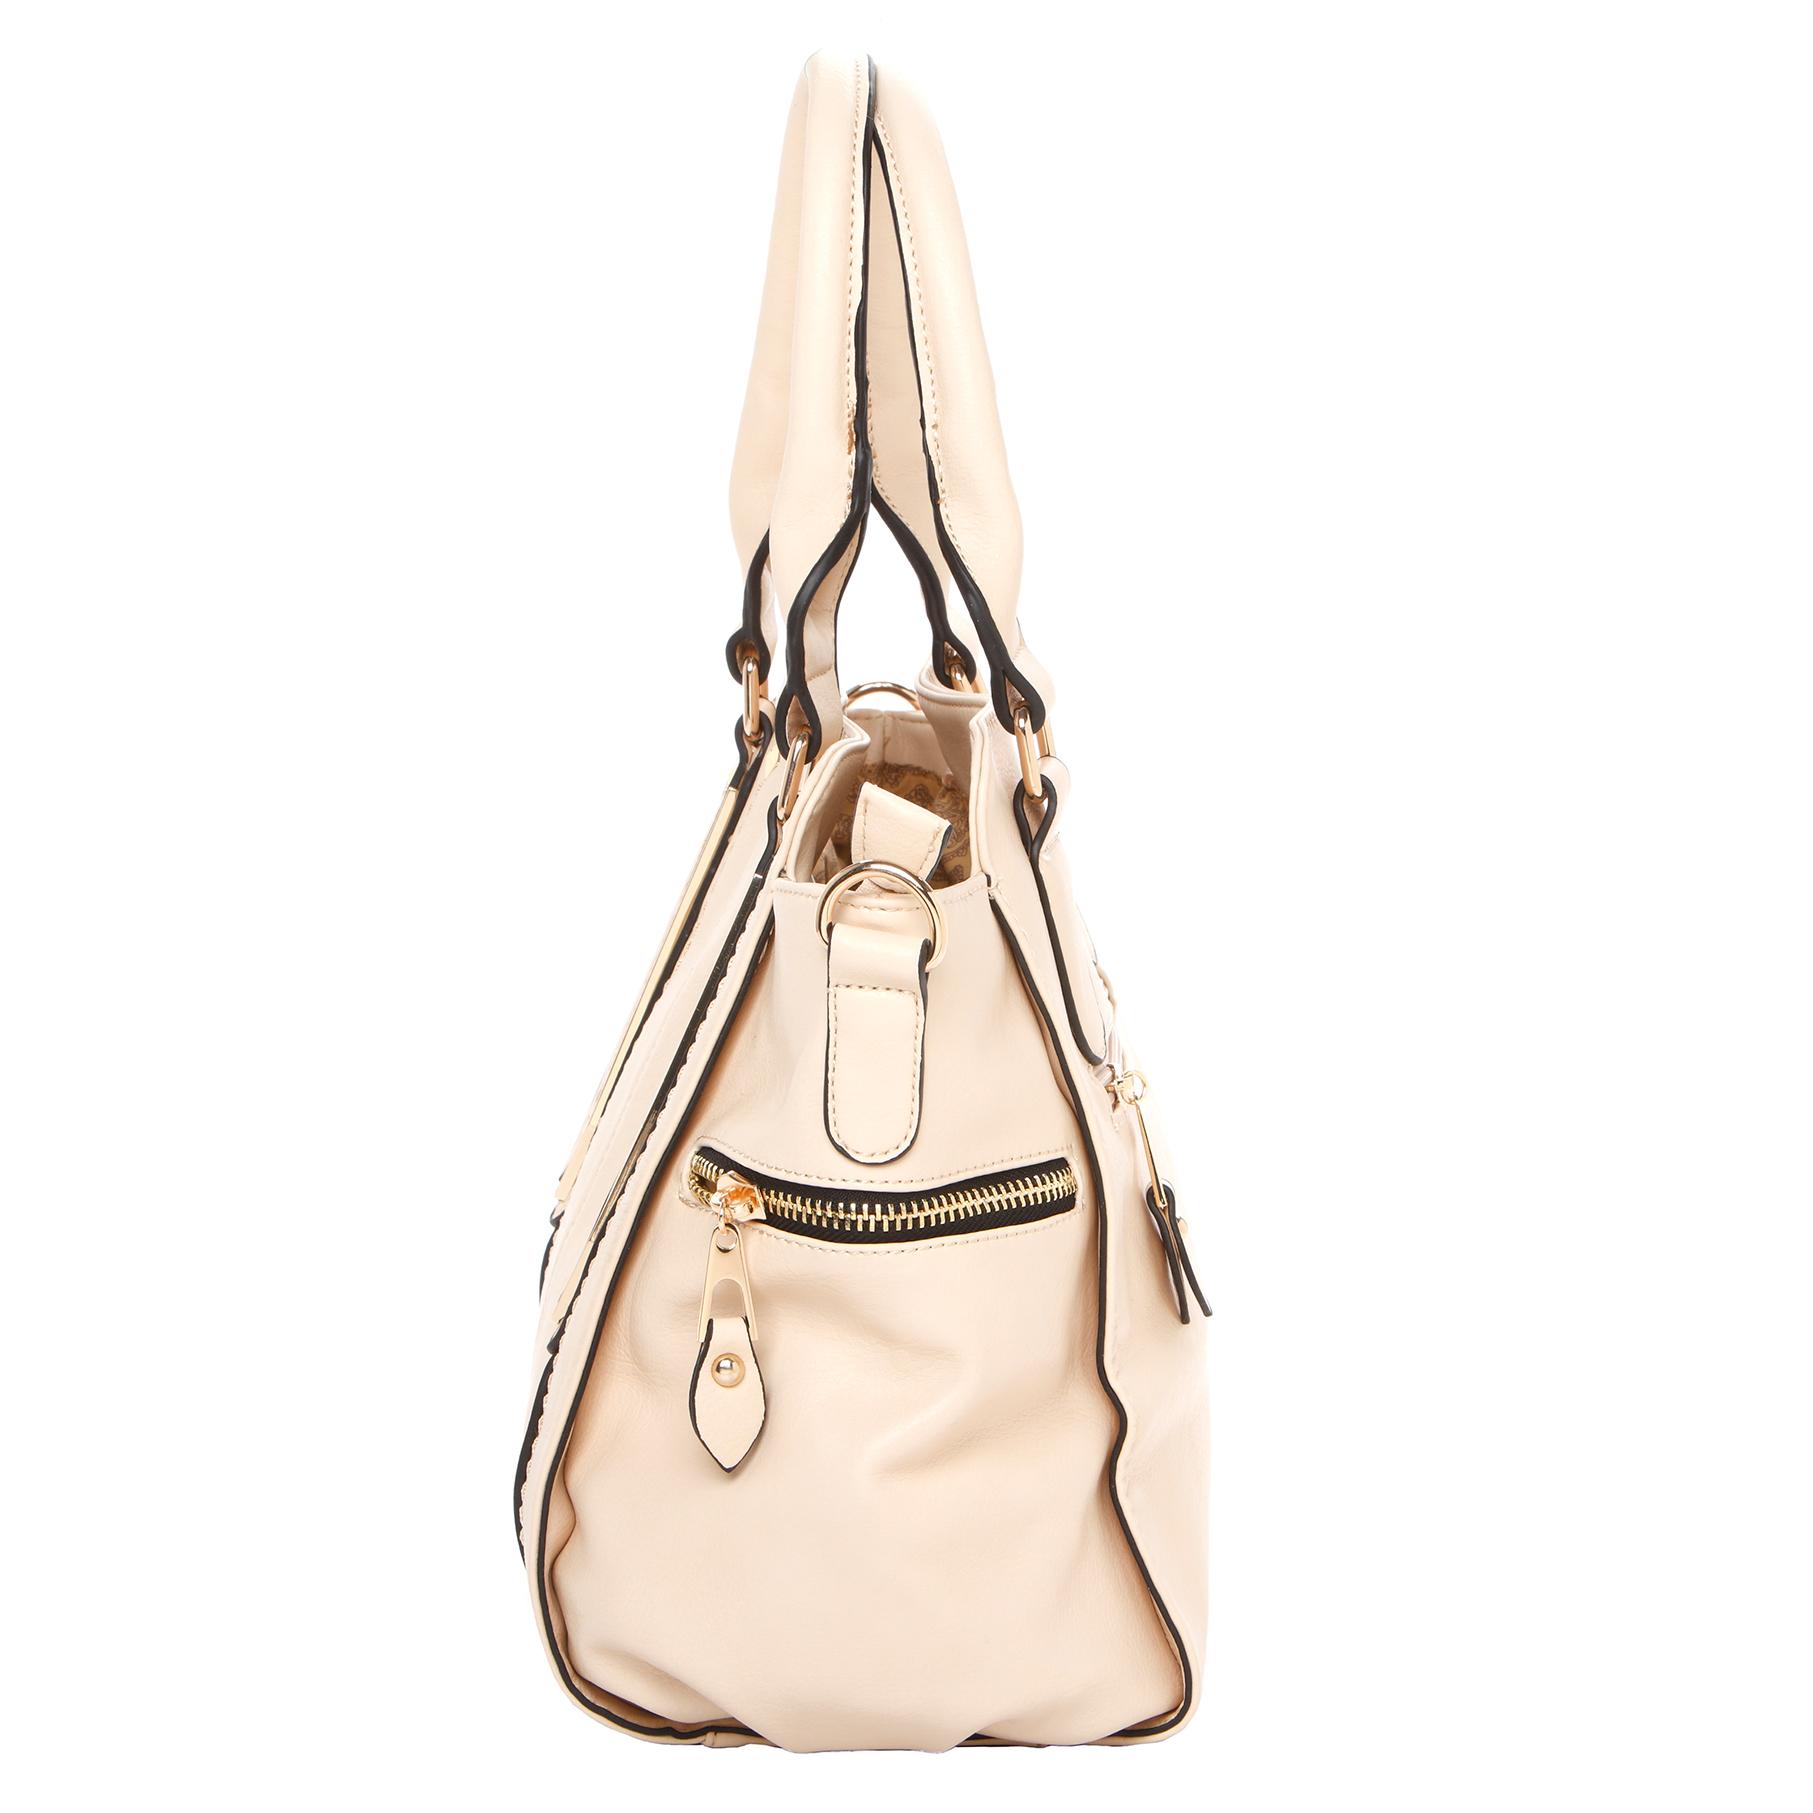 NORI Beige Top Handle Office Tote Style Satchel Handbag side